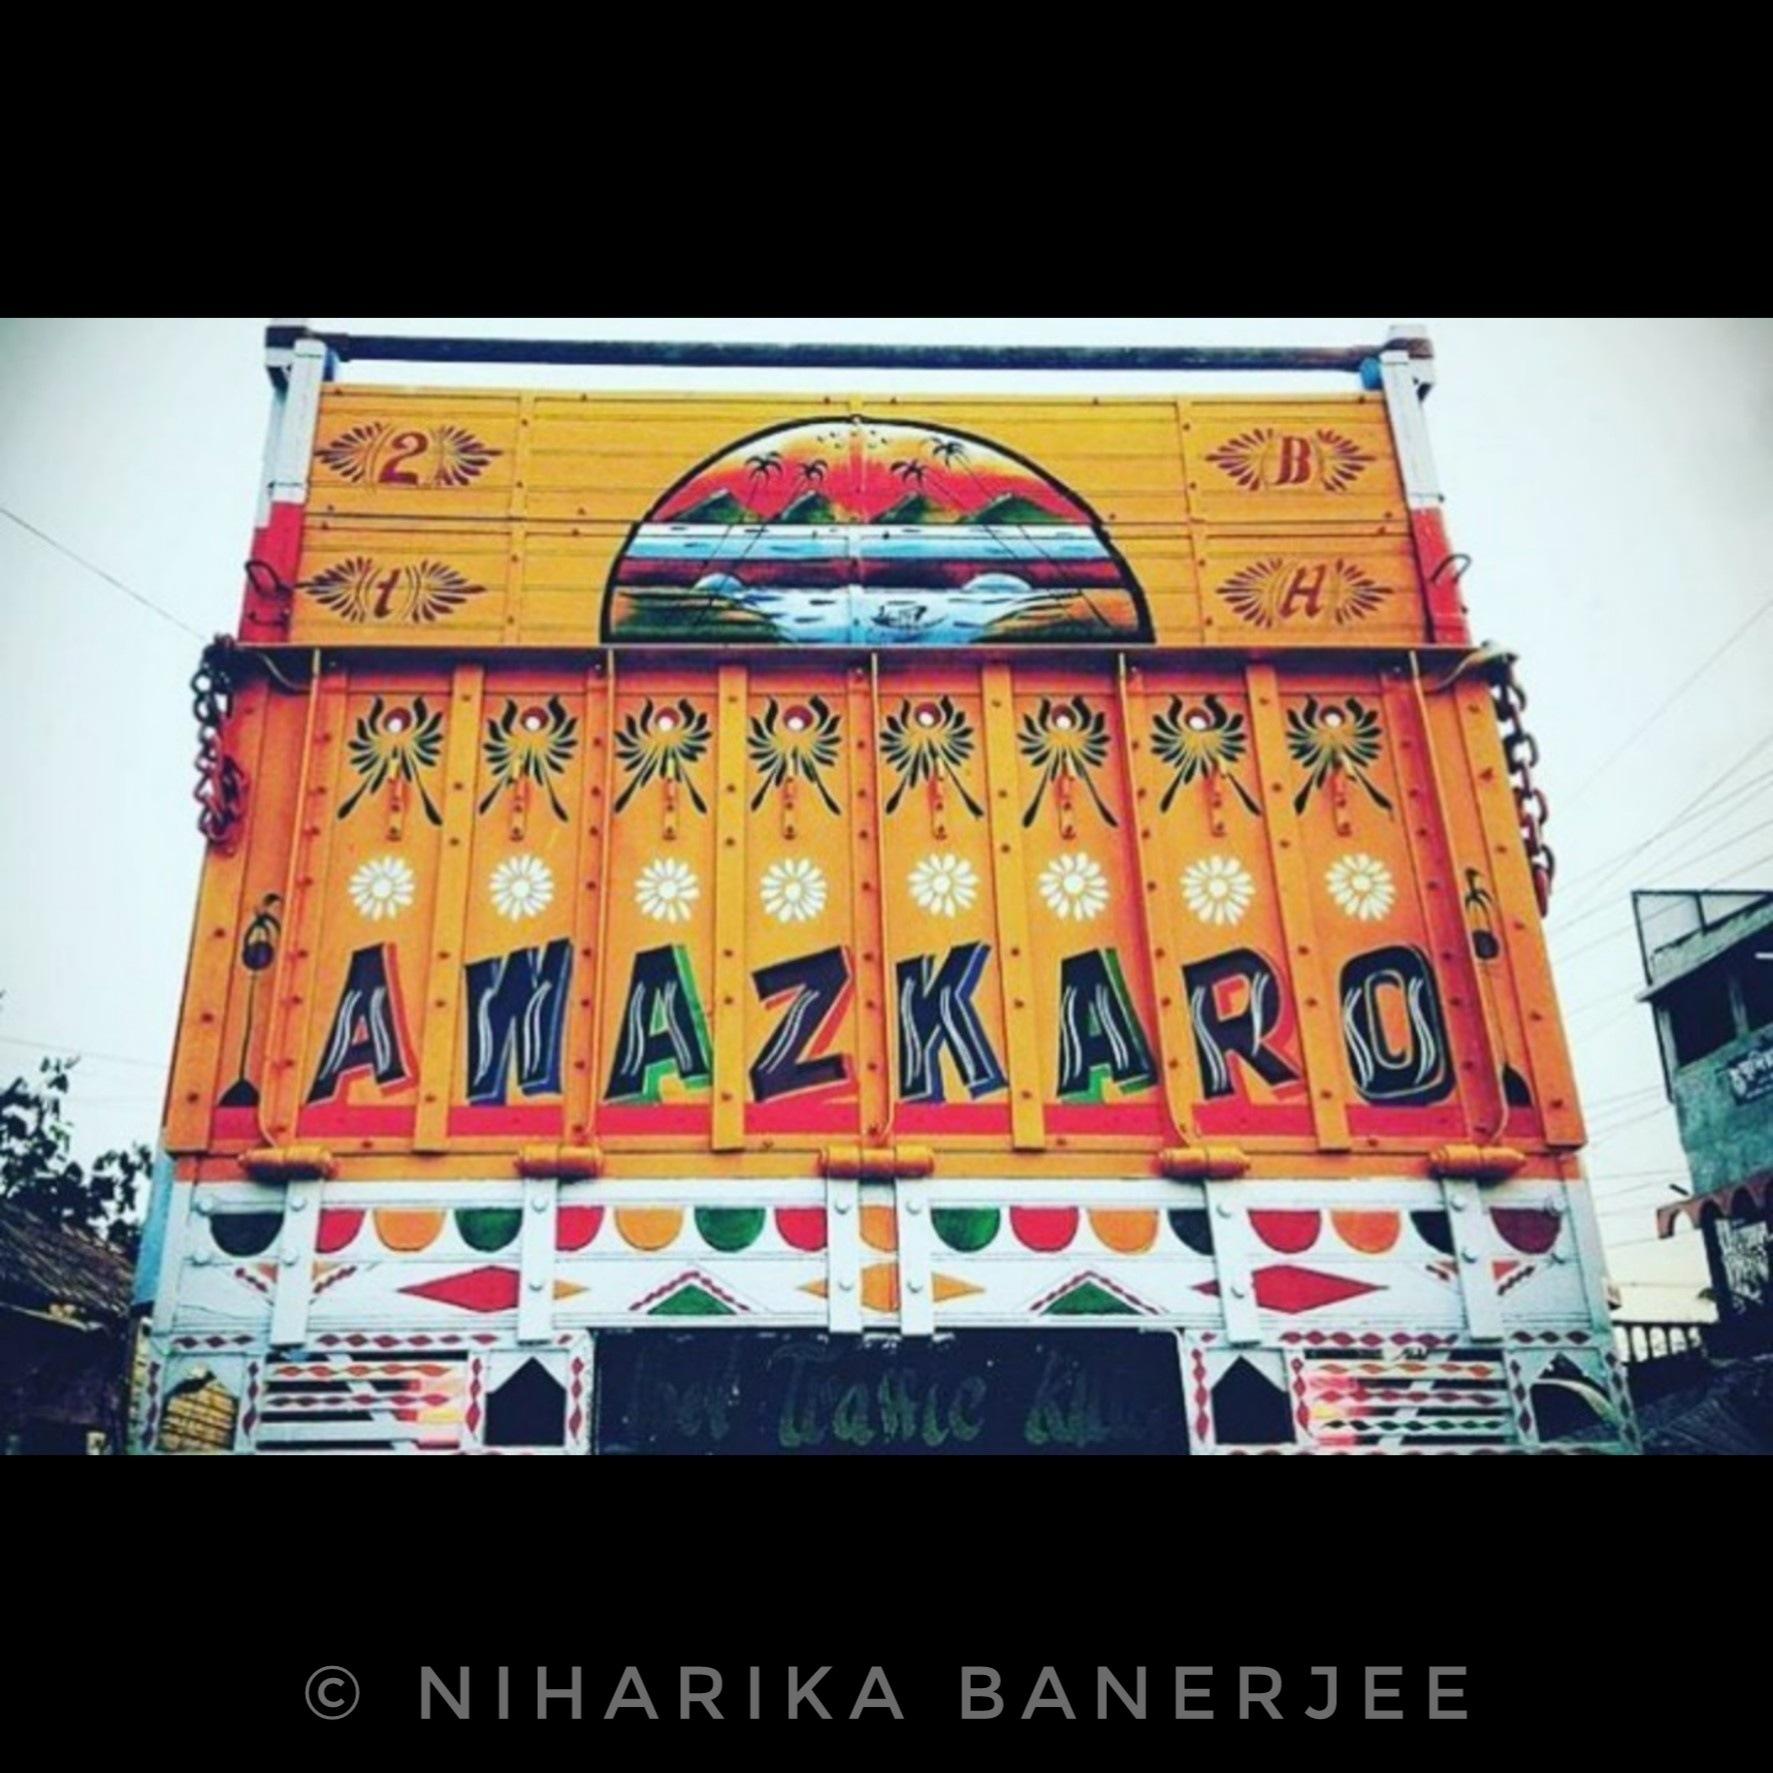 Awaz karo by Niharika Banerjee